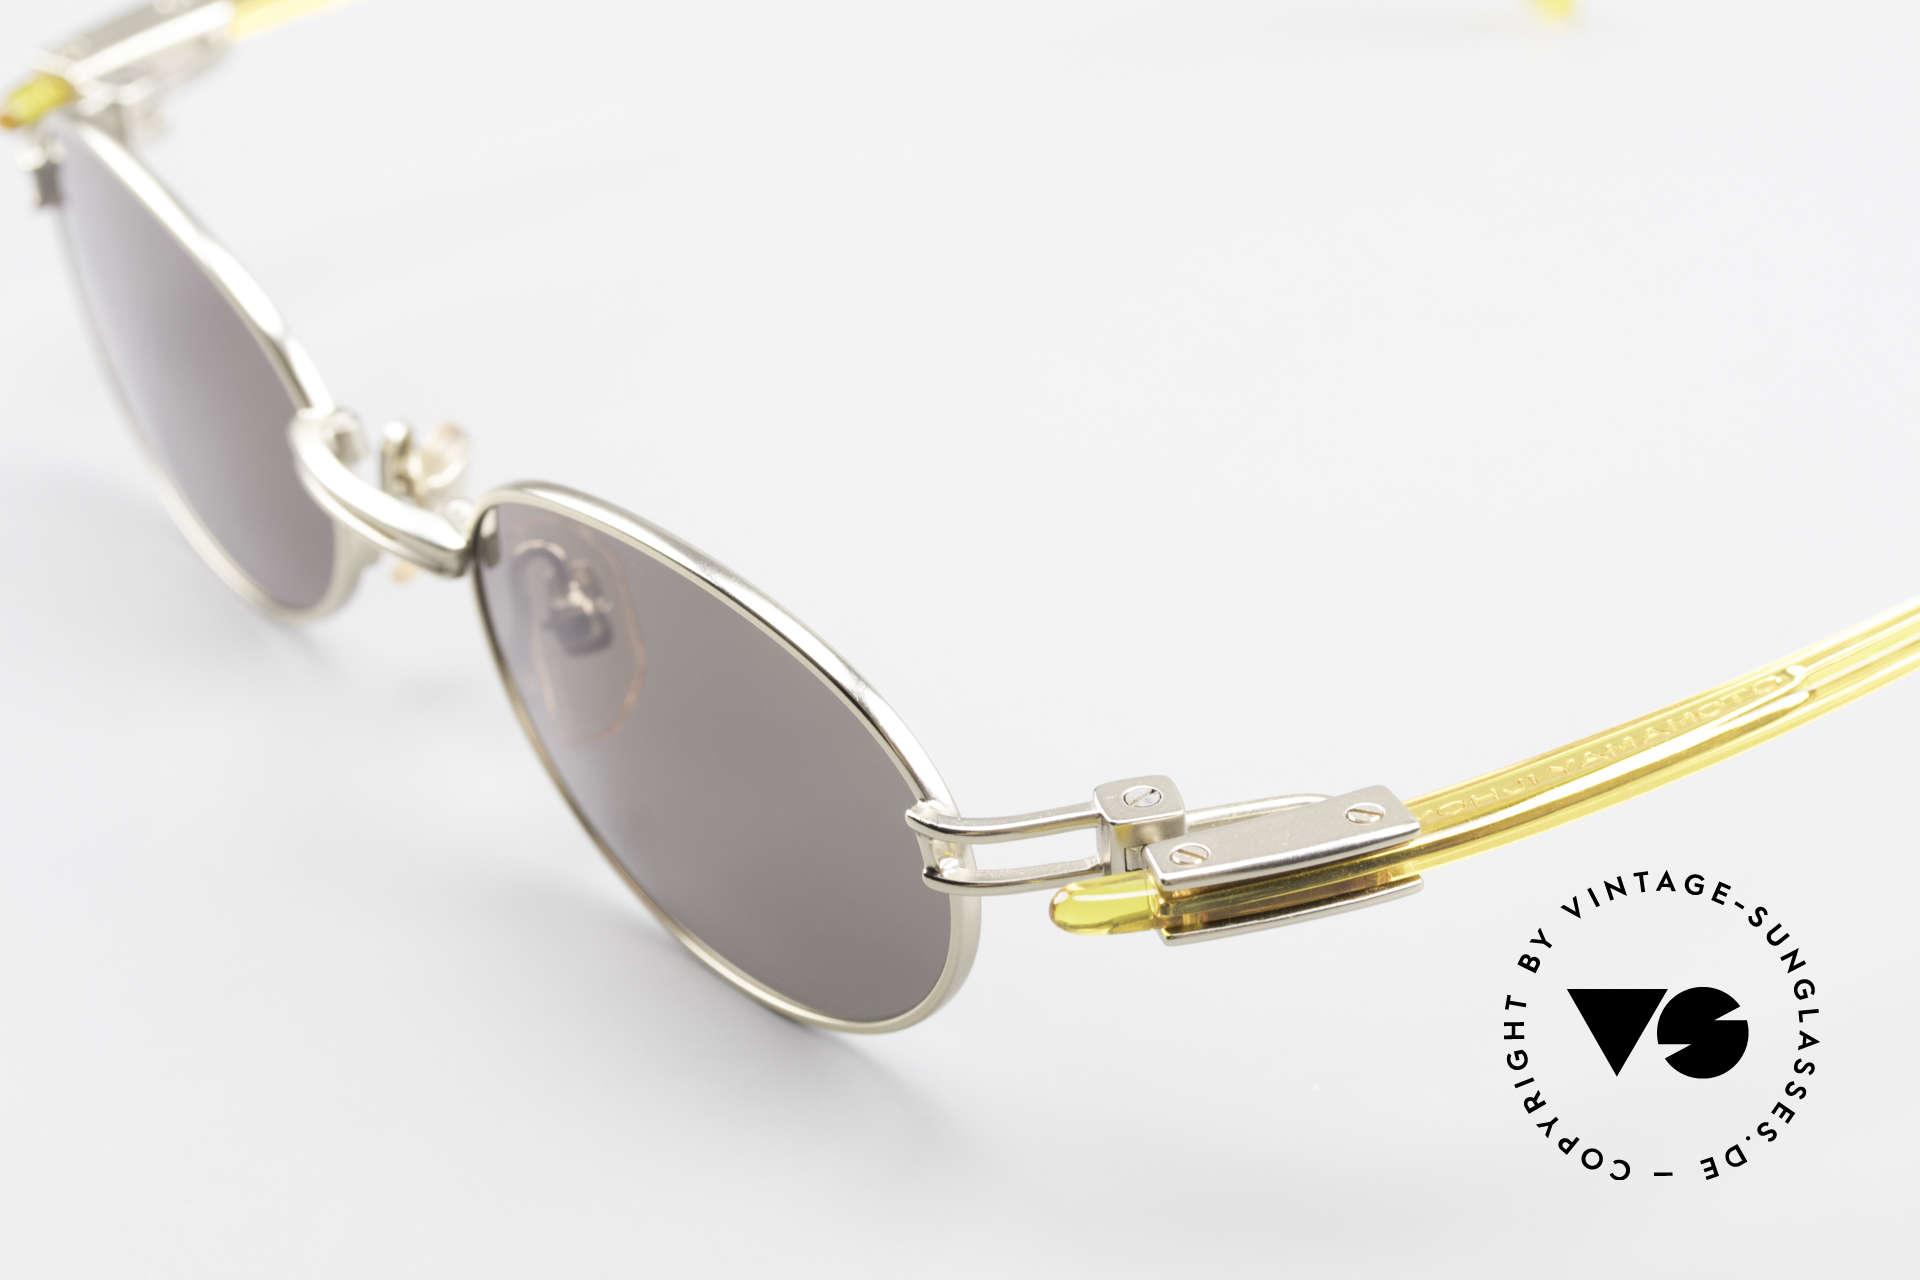 Yohji Yamamoto 52-7202 Designer Shades Oval Vintage, unworn (like all our rare vintage YY designer sunglasses), Made for Men and Women